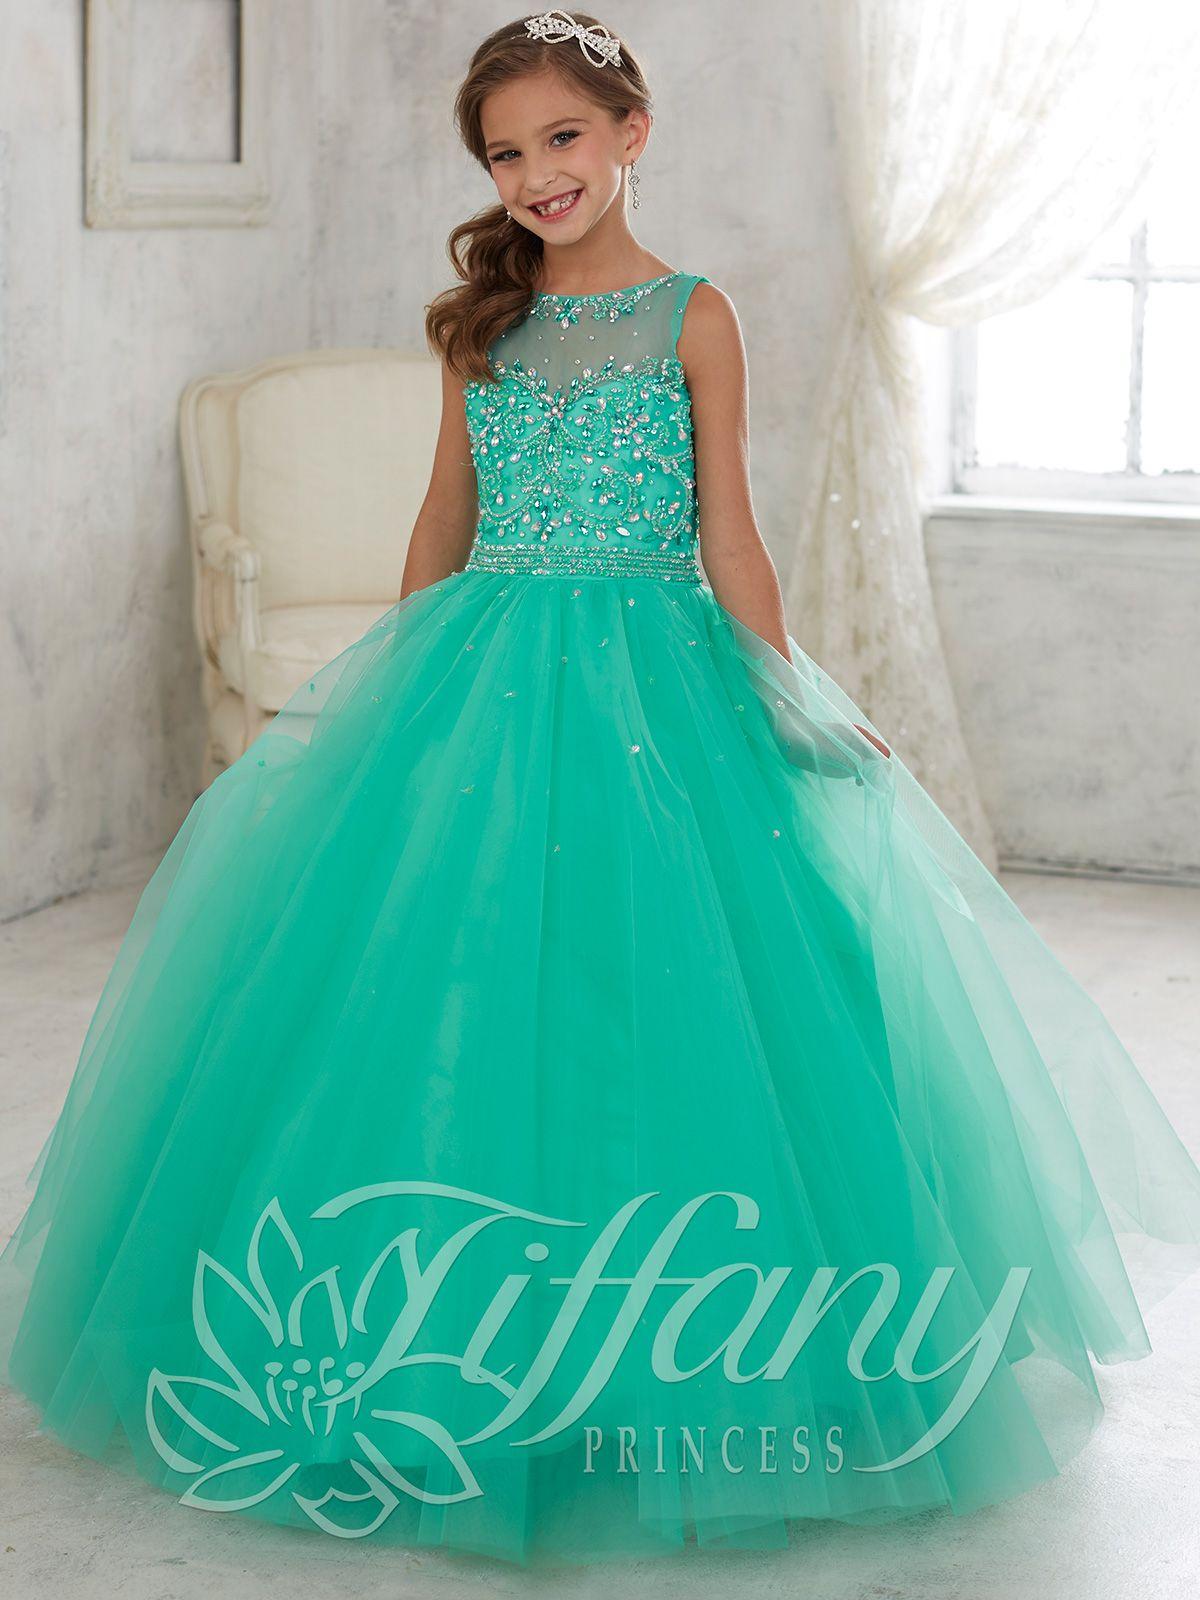 Tiffany Princess 13442 Illusion Neckline Girls Pageant Dress ...